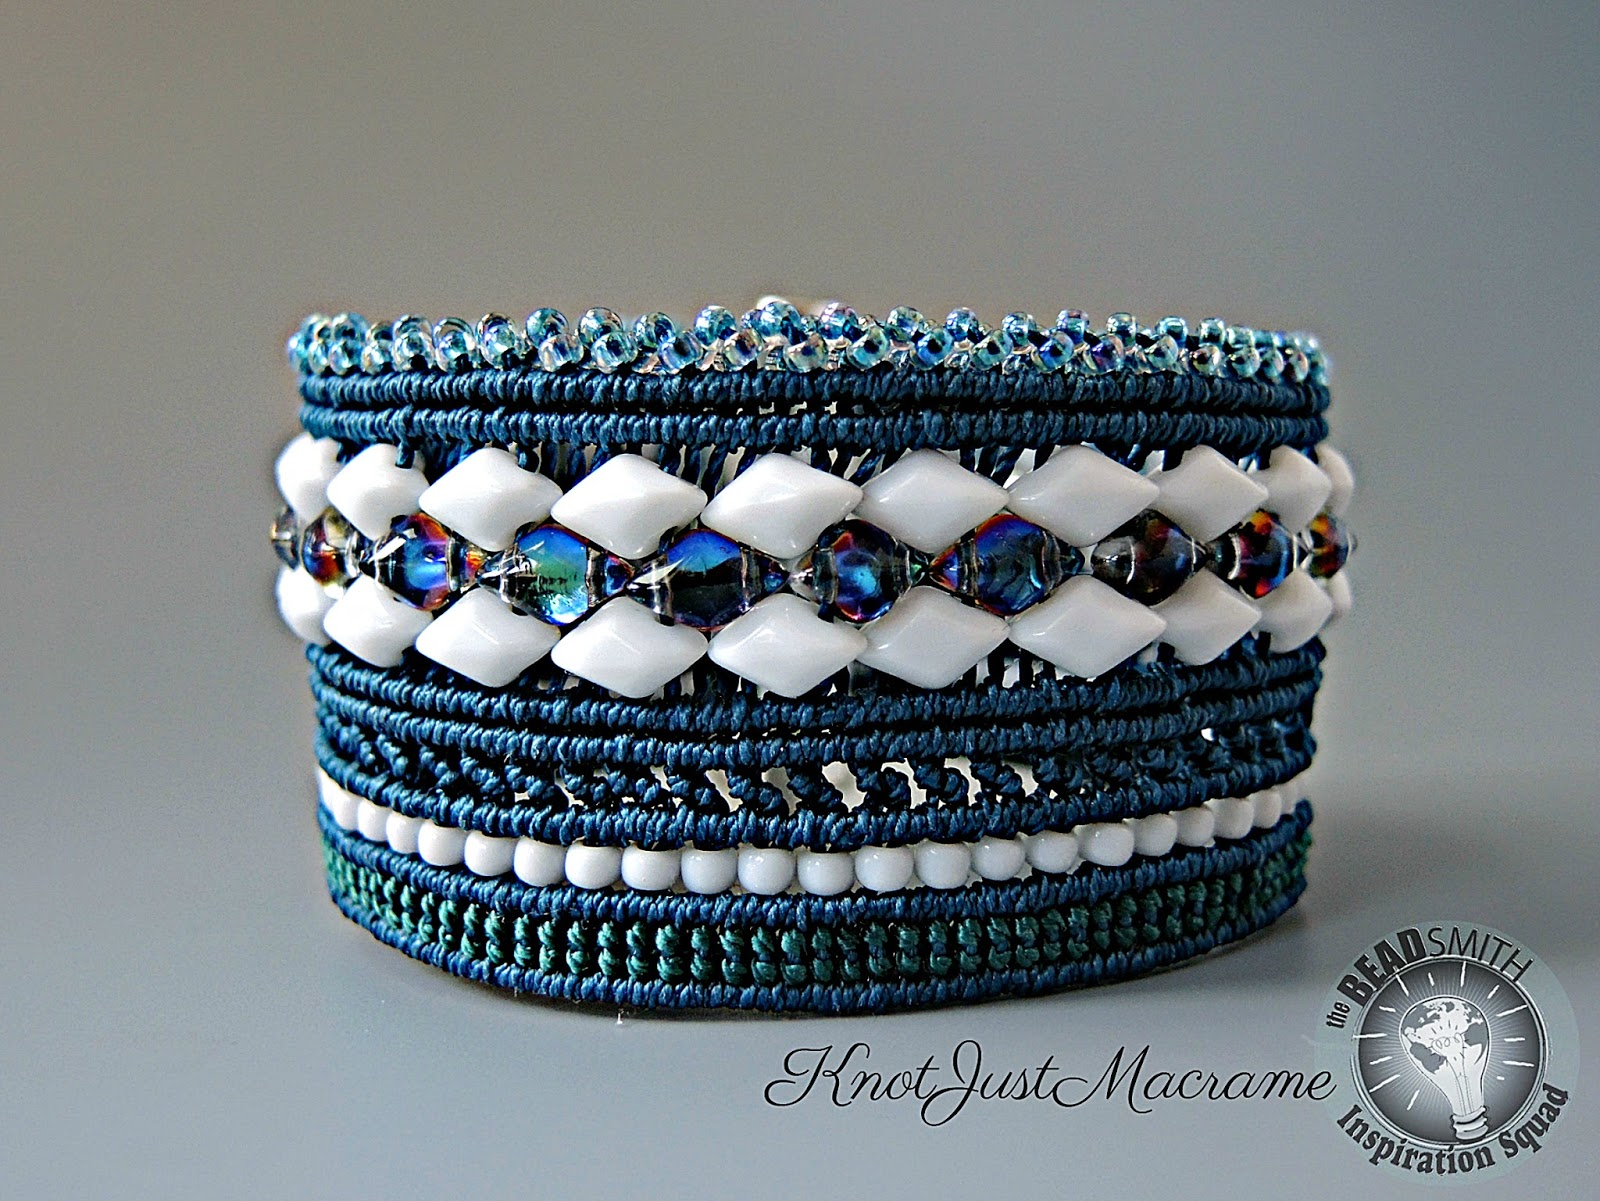 Knot Just Macrame by Sherri Stokey: Winter and Beaded Micro Macrame